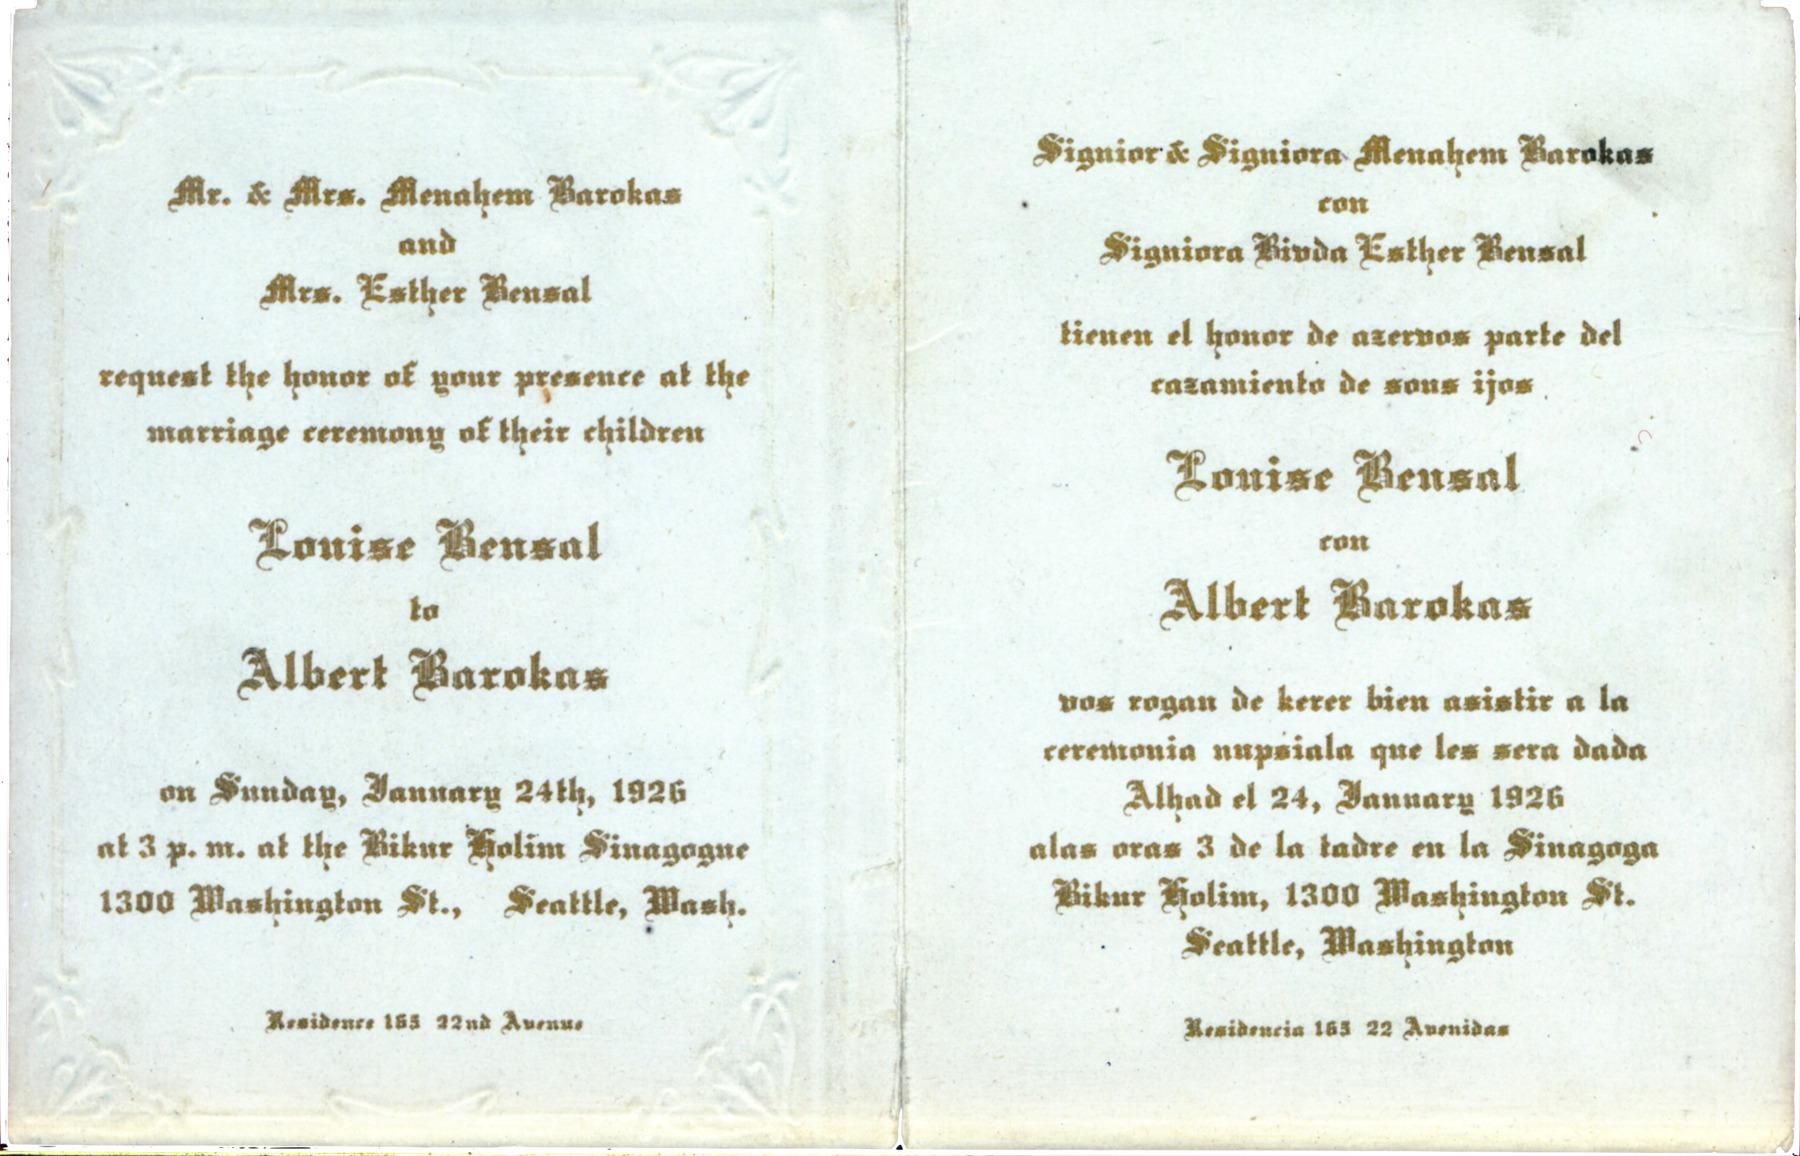 Louise Bensal and Albert Barokas wedding invitation